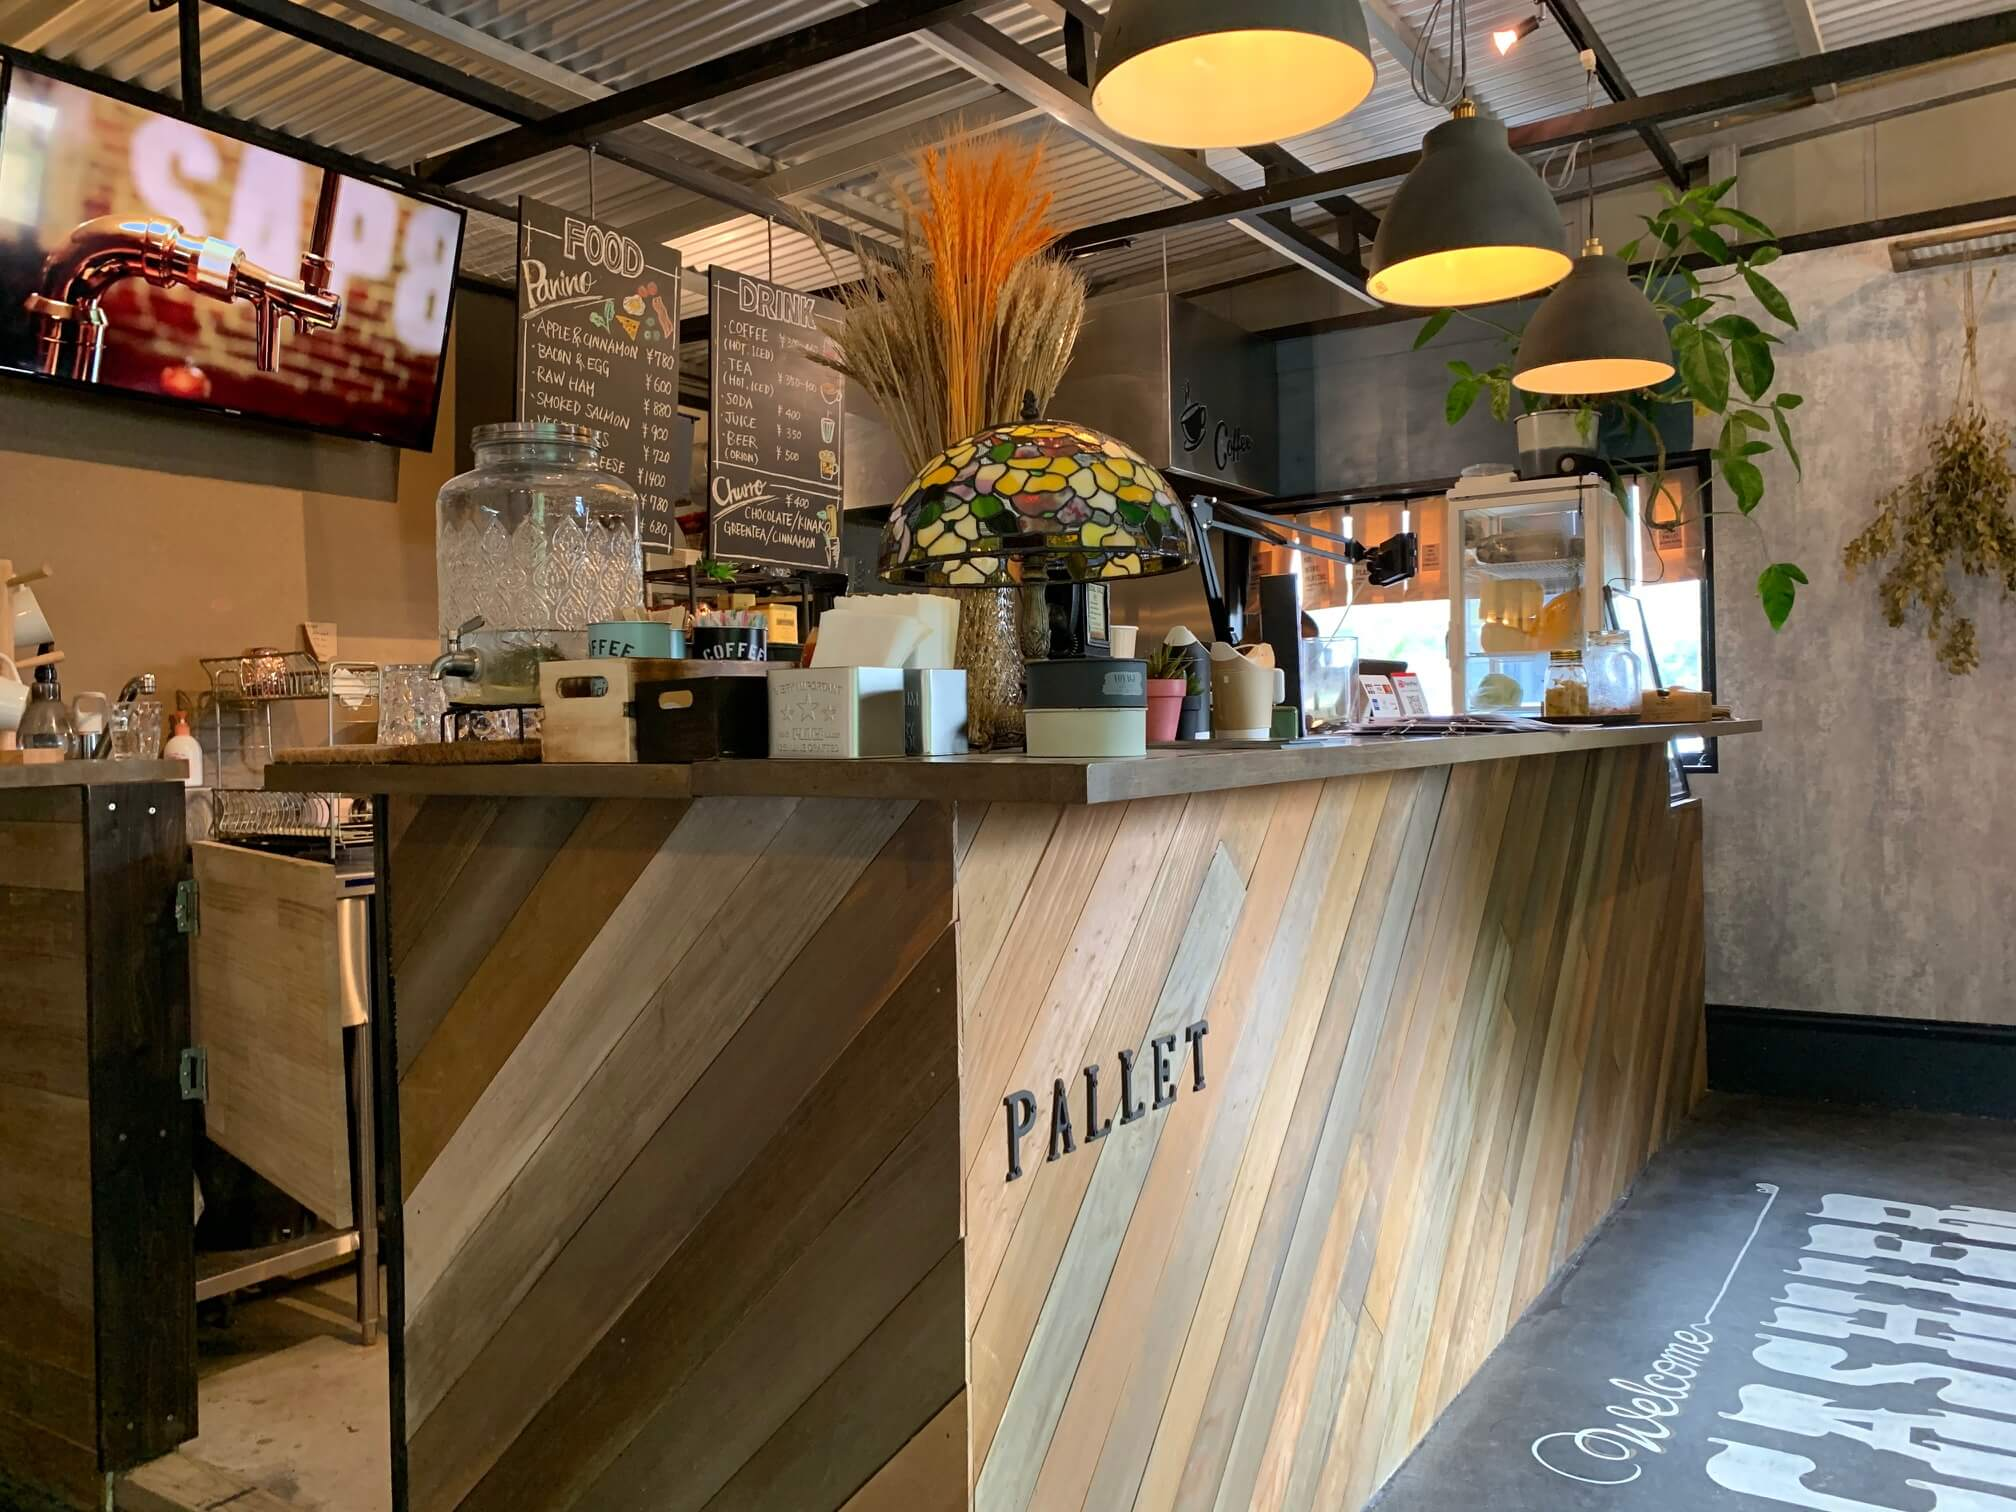 PANINO&COFFEE PALLET